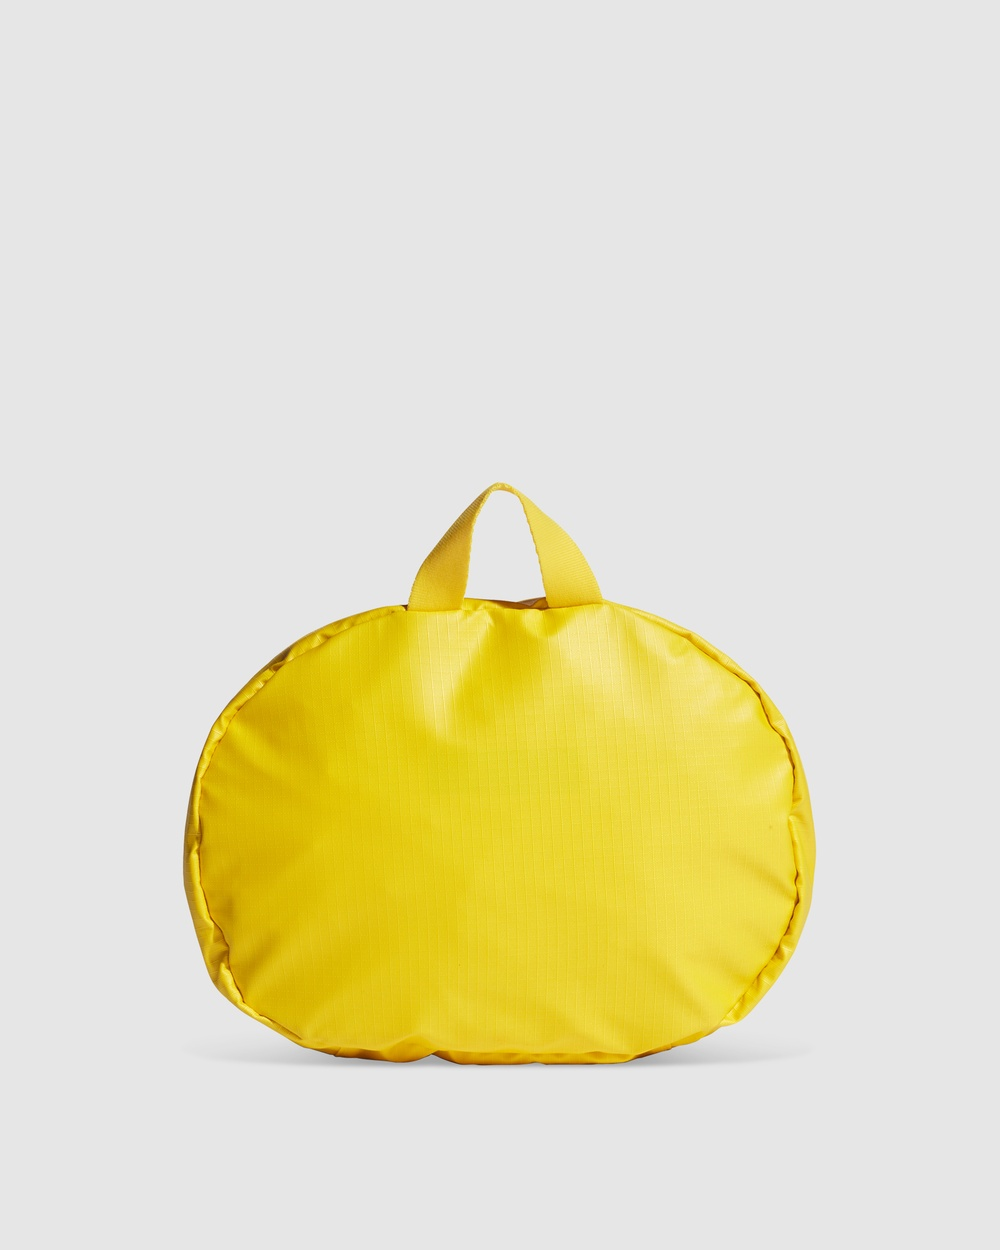 adidas Performance by Stella McCartney Small Bag Set Bags Yellow